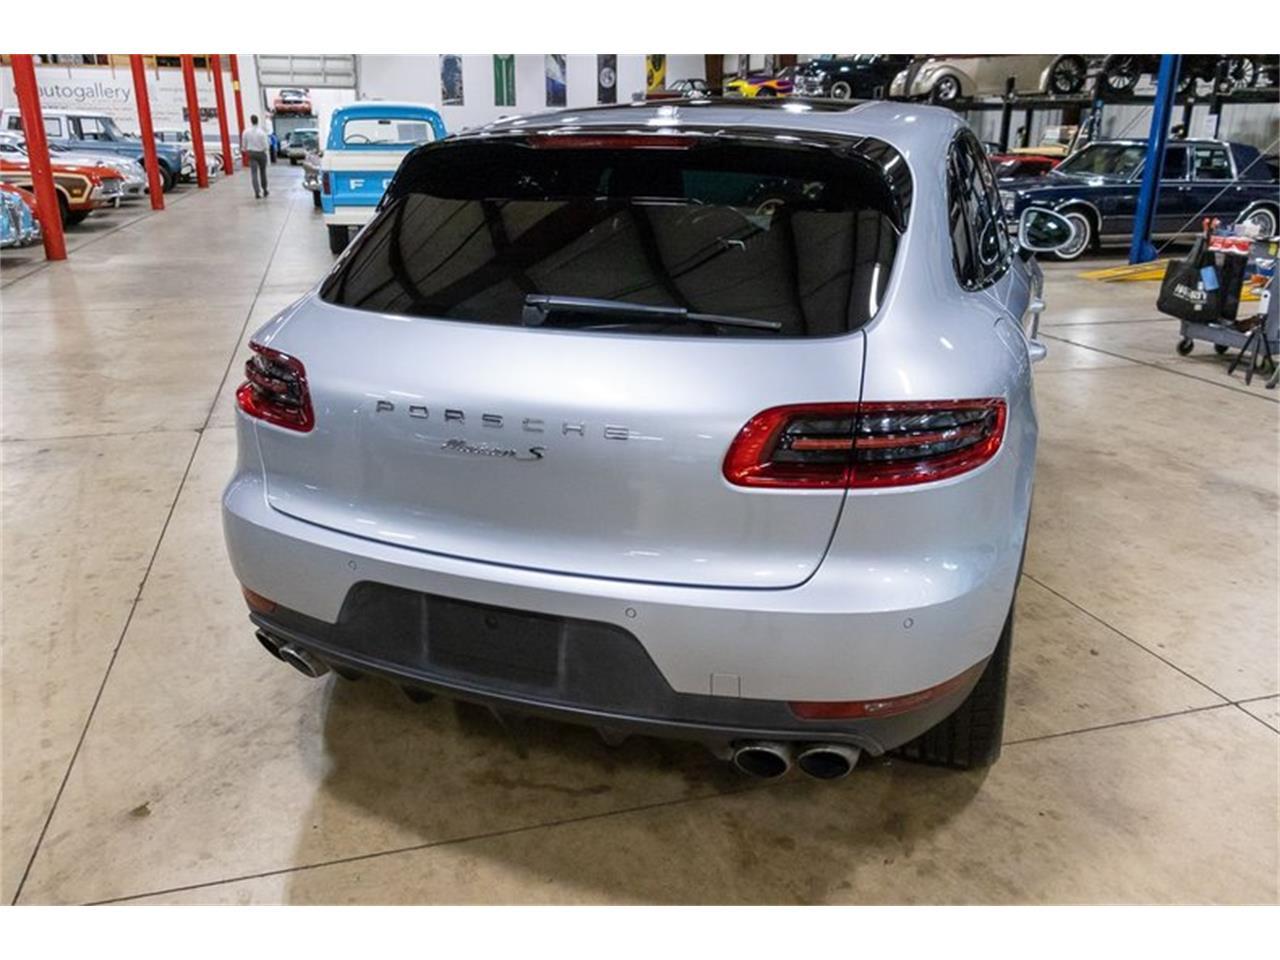 2016 Porsche Macan (CC-1383786) for sale in Kentwood, Michigan